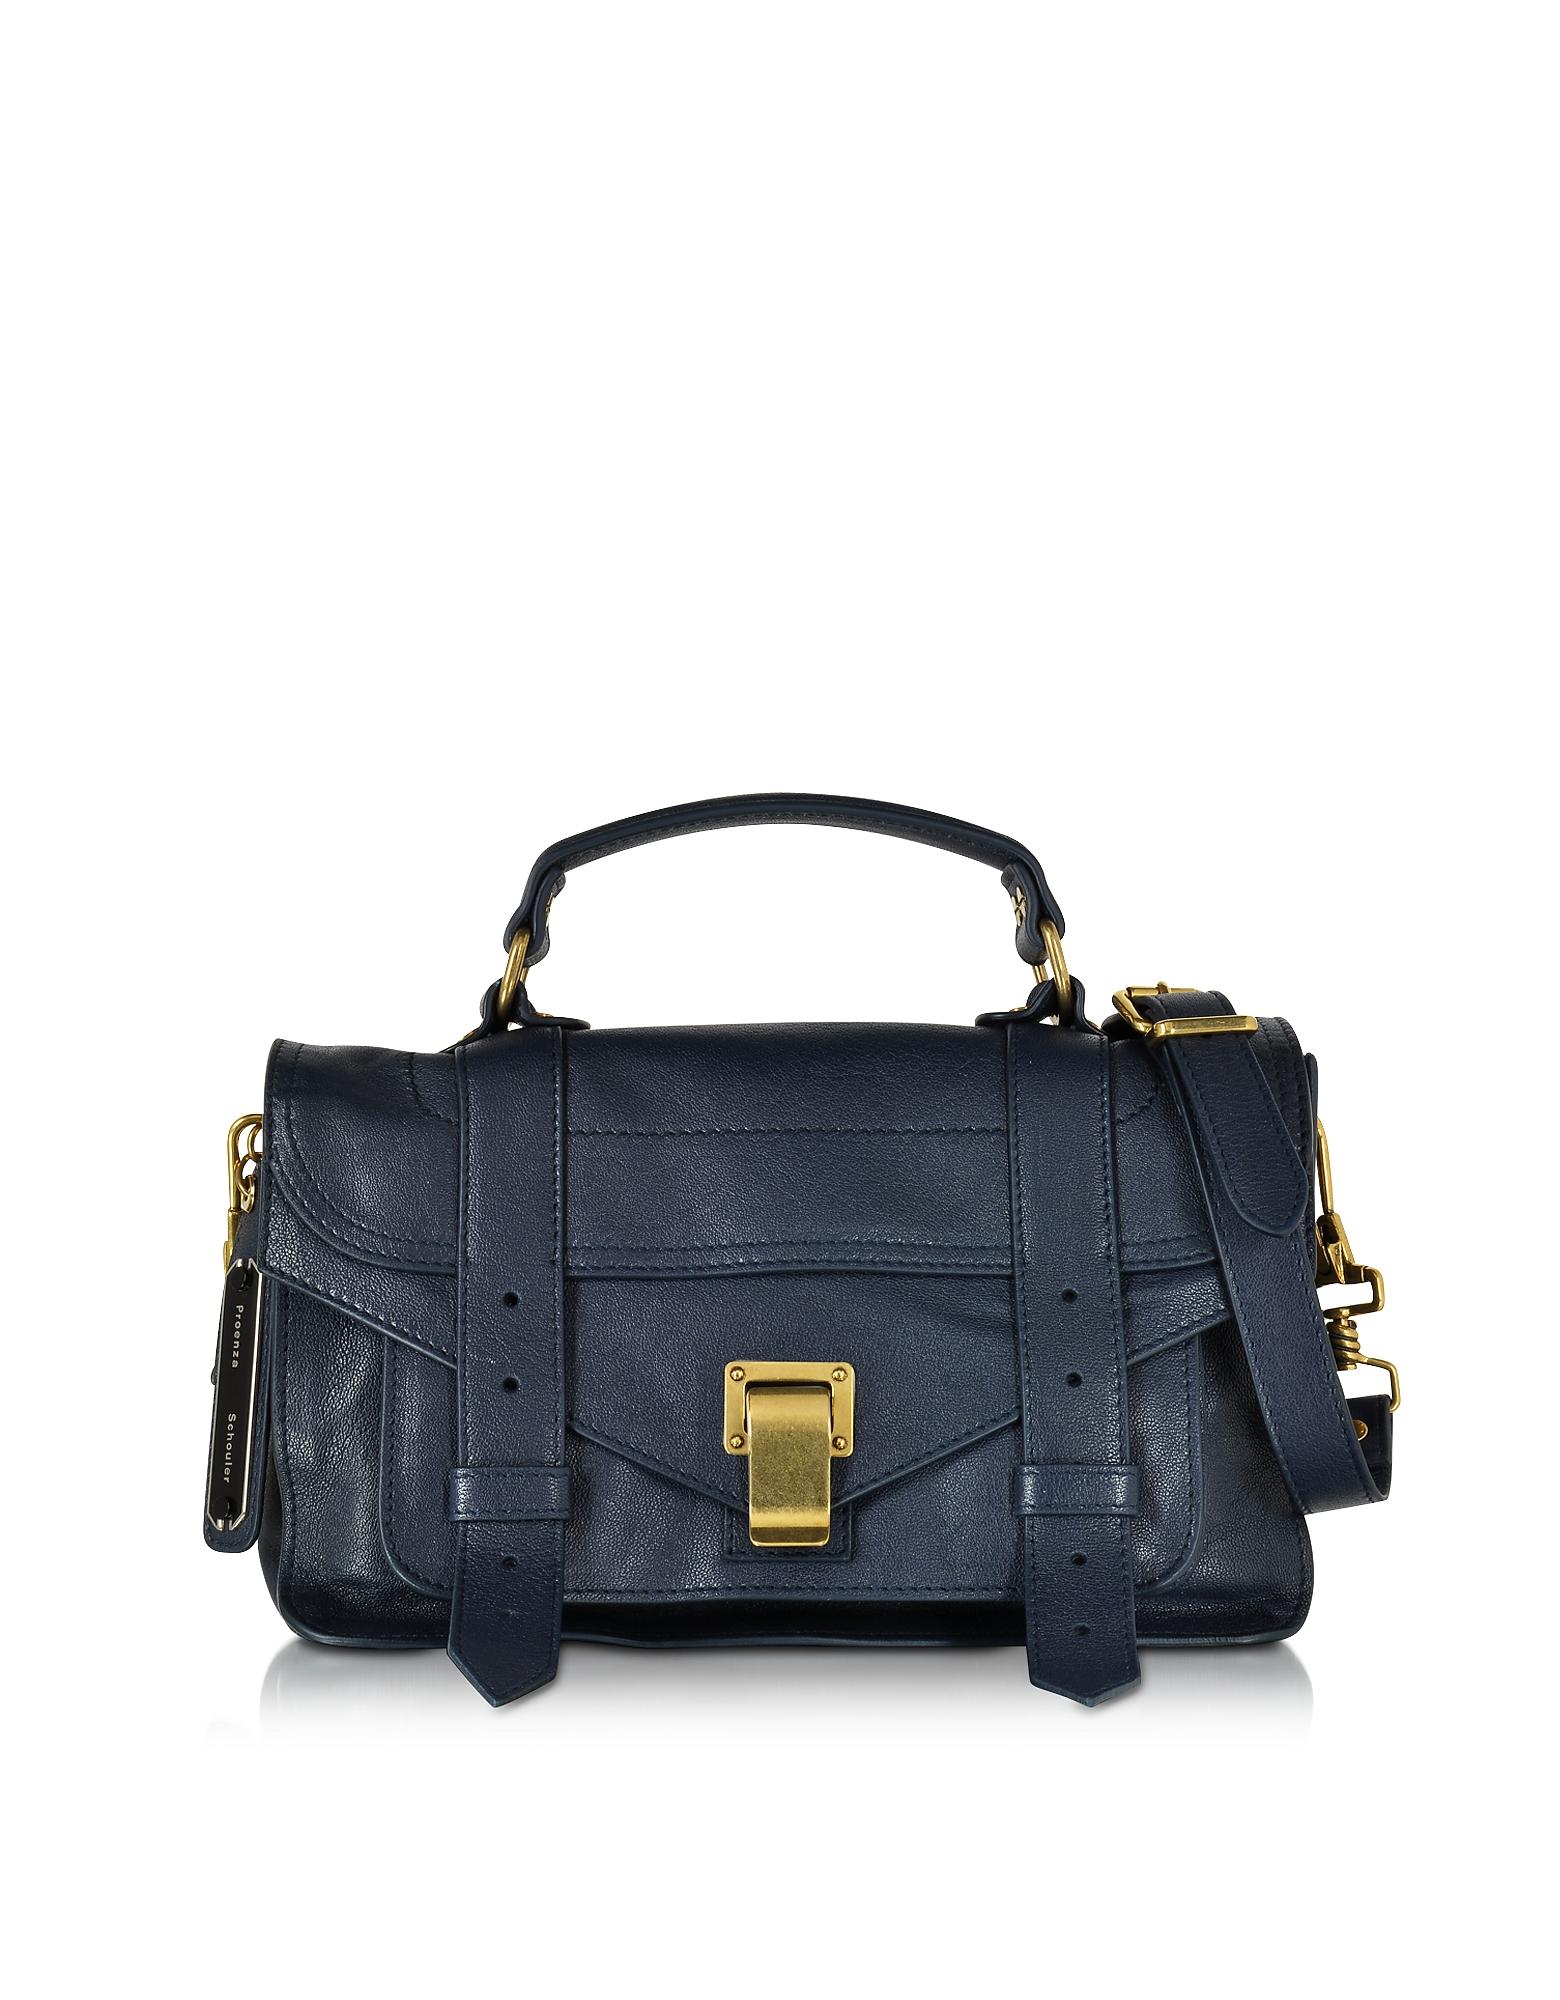 Proenza Schouler Handbags, PS1 Tiny Lux Midnight Leather Satchel Bag